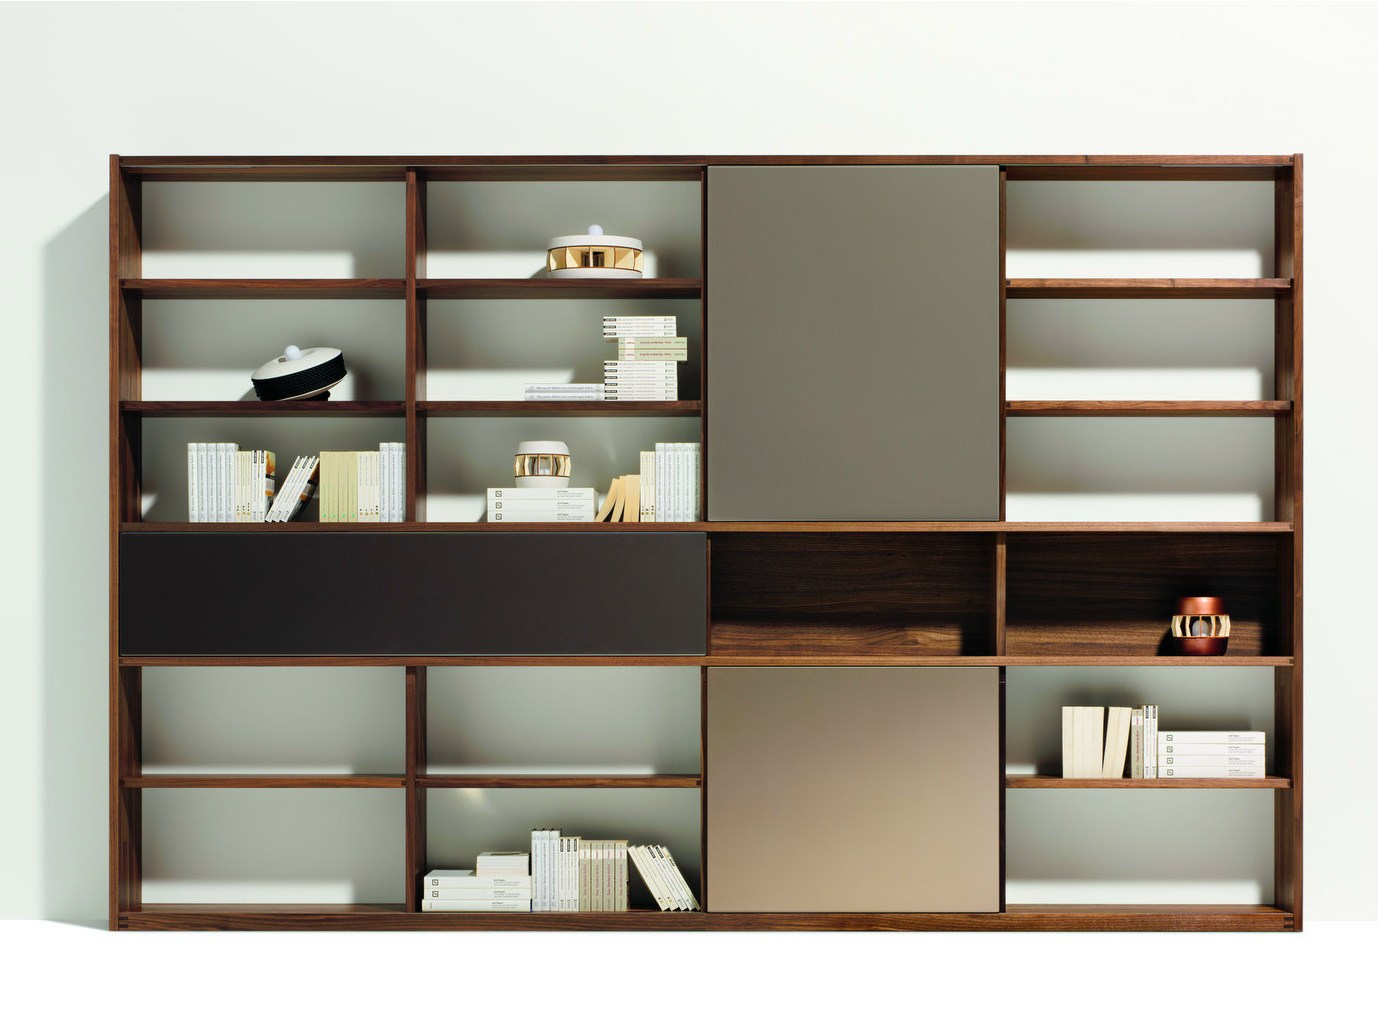 cubus | bookcase by team 7 design sebastian desch - Bucherregal Design Carpanelli Wohnung Highlight